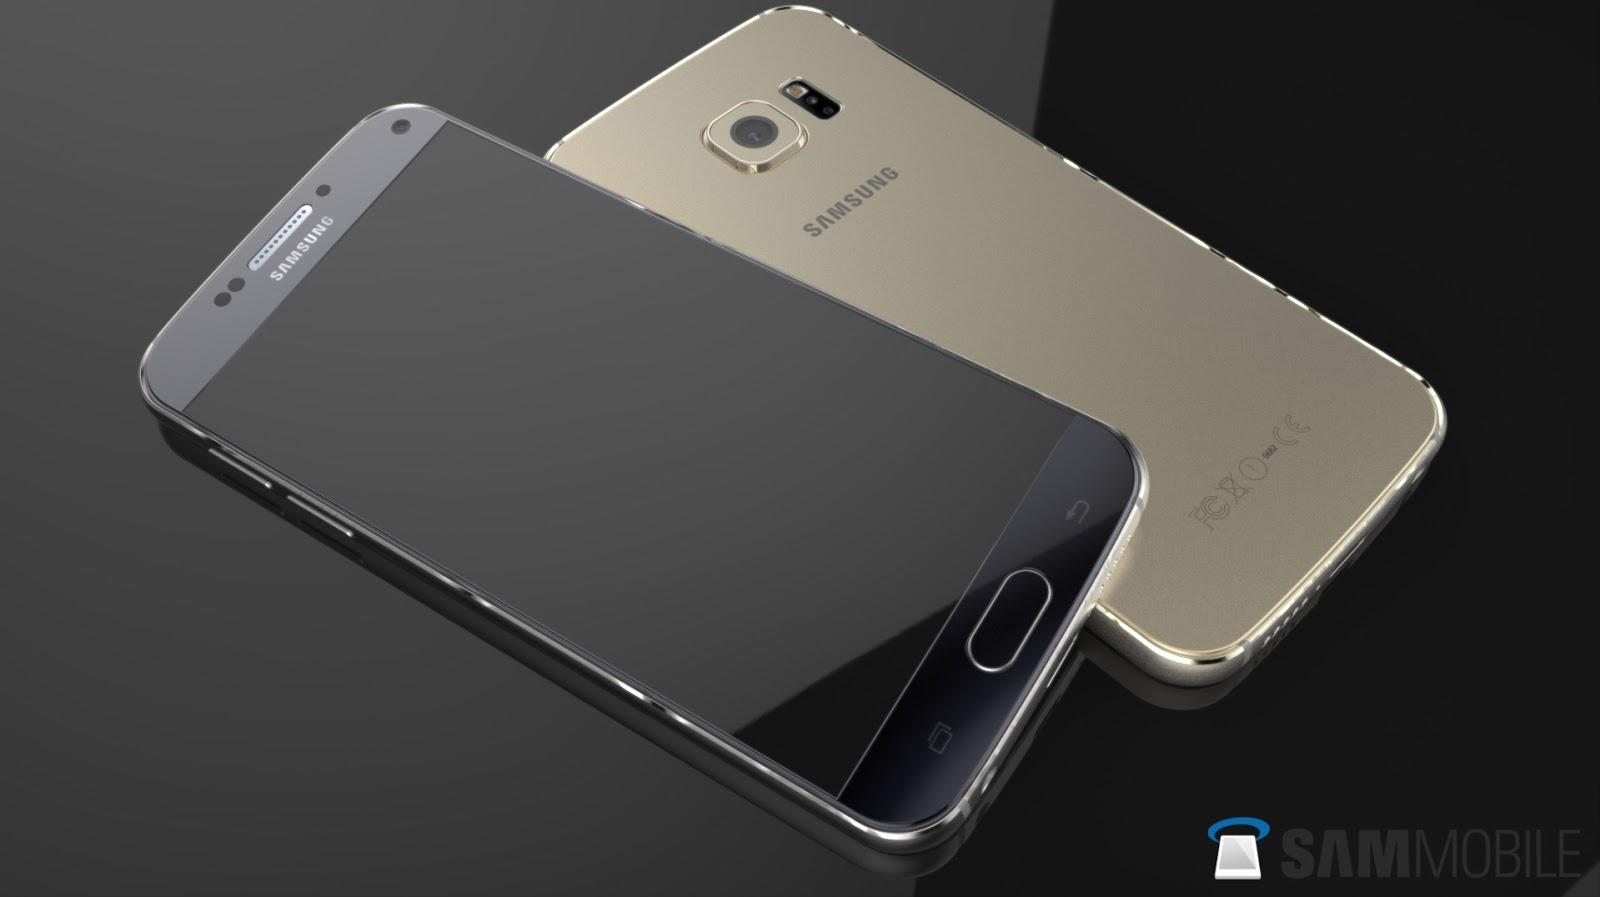 Nokia xl price nigeria - Samsung Galaxy S7 Price In Nigeria